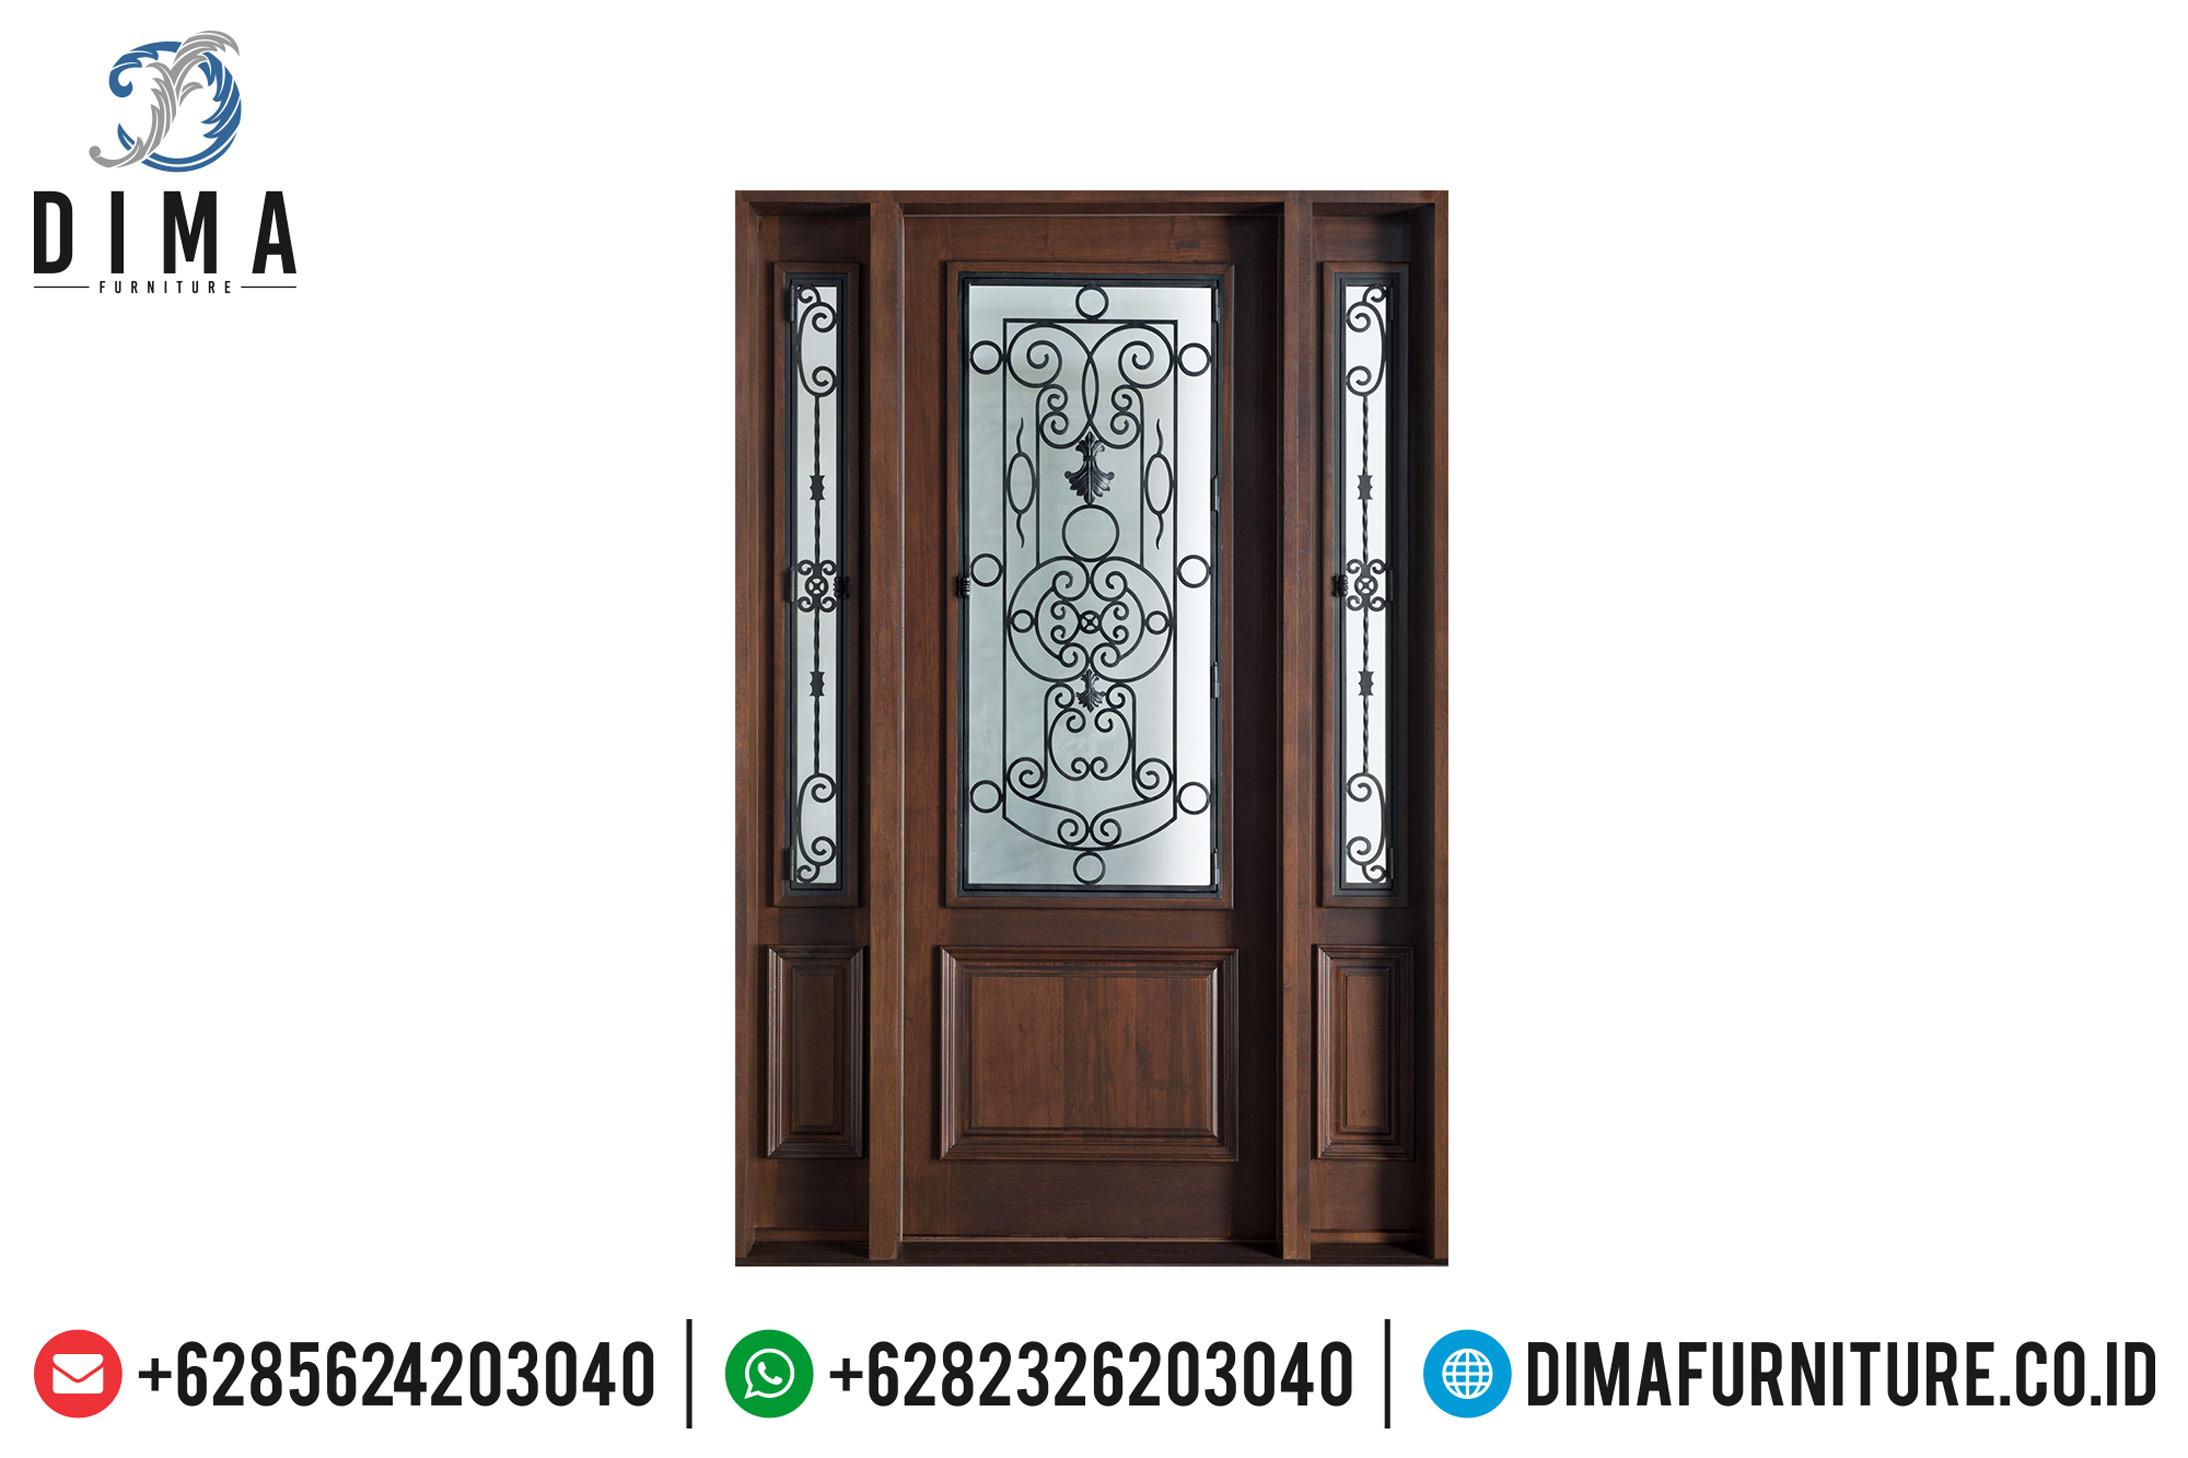 Kusen Pintu Kayu Jati TPK Perhutani Natural Classic Ukiran Jepara TTJ-0498